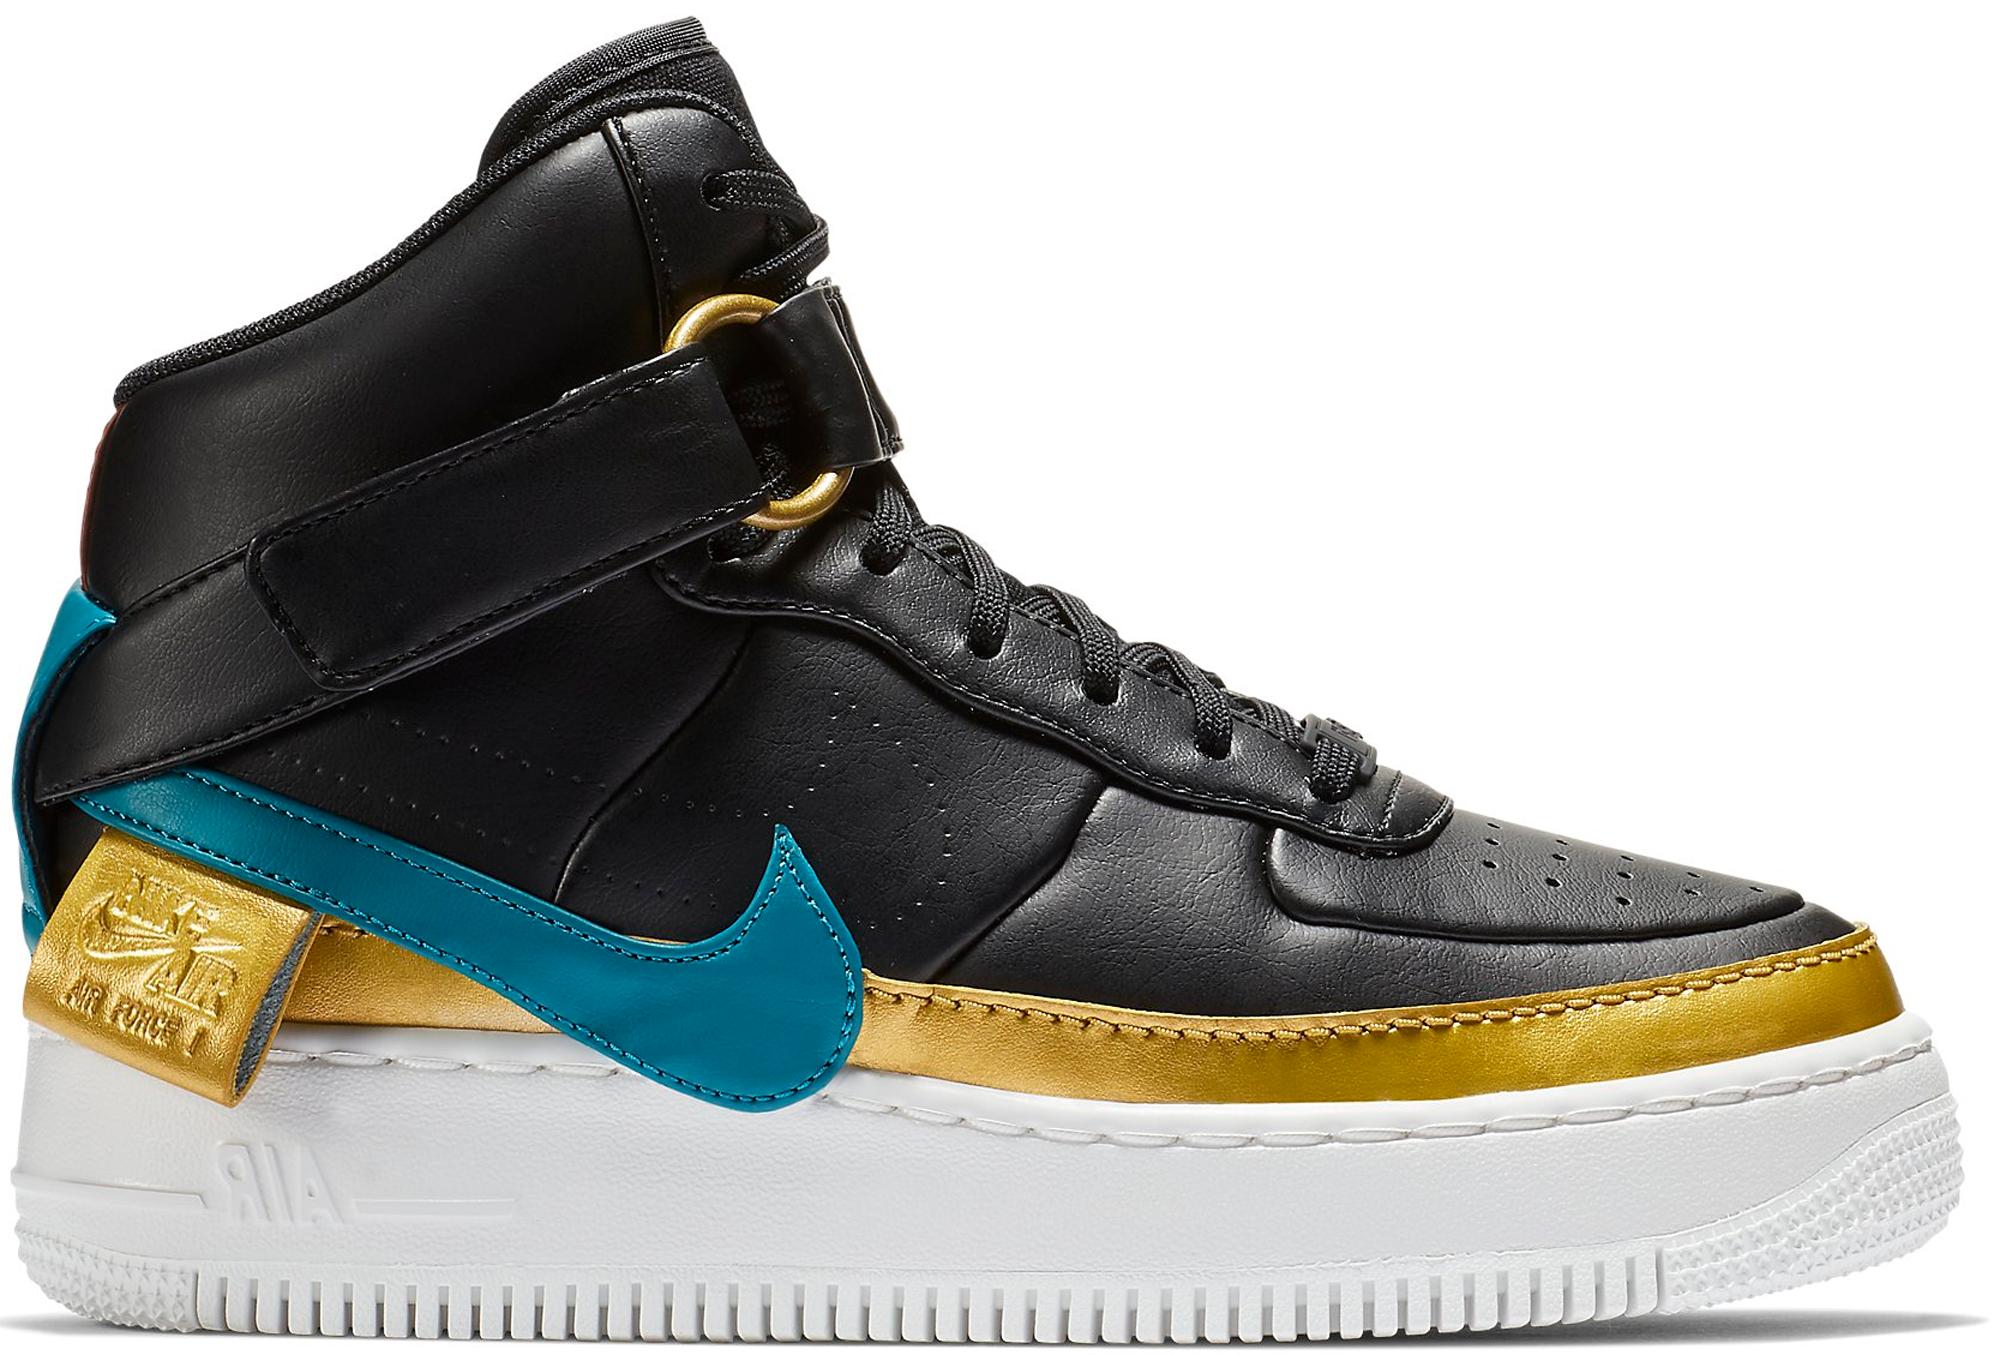 Nike Air Force 1 High Jester XX Black